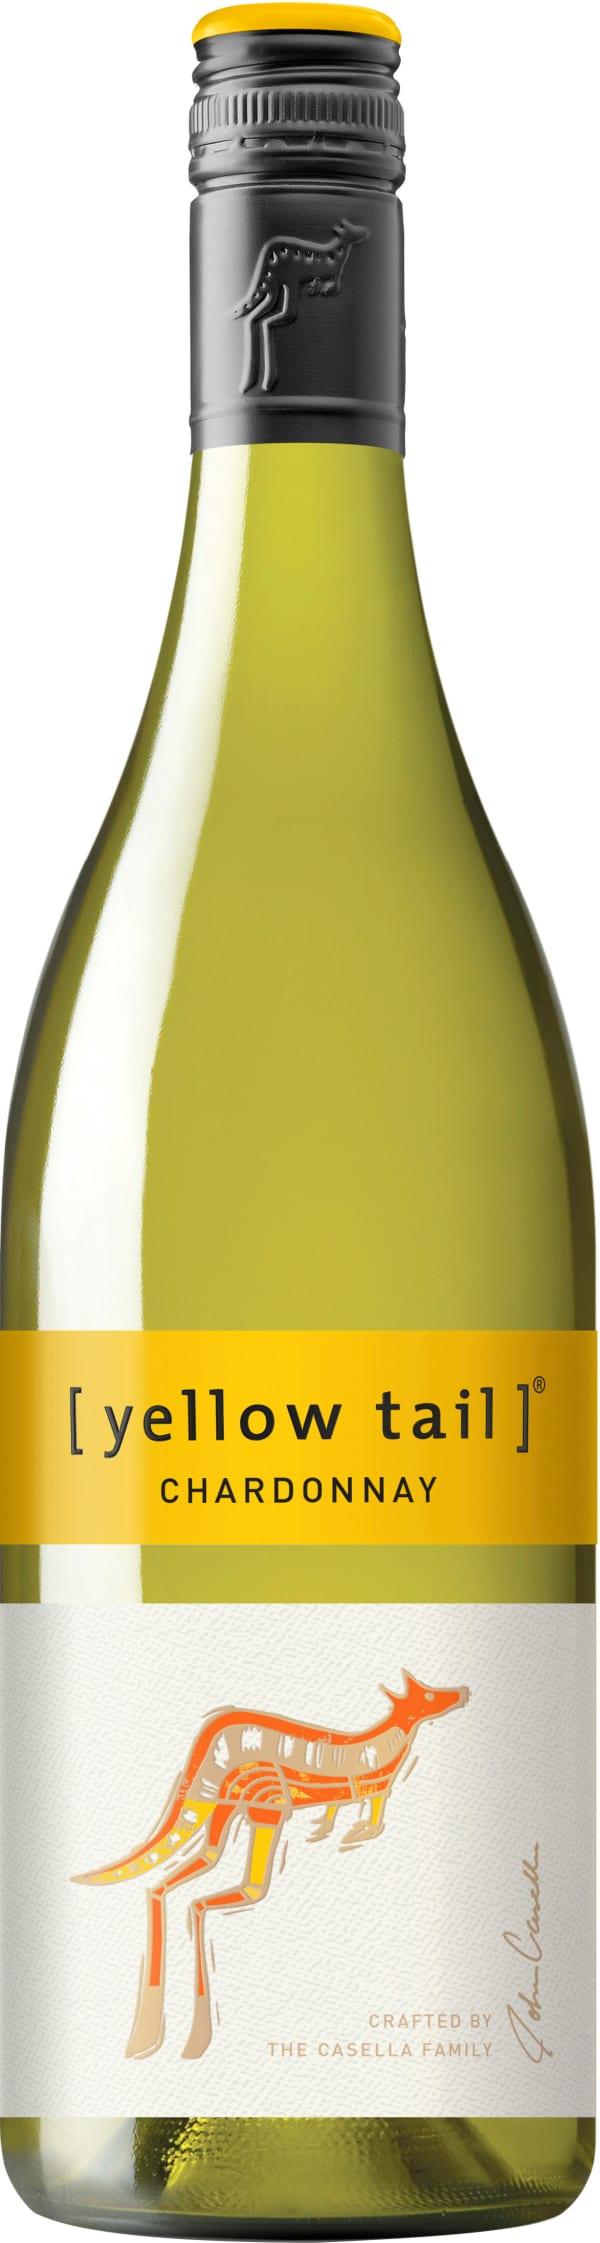 Yellow Tail Chardonnay 2018